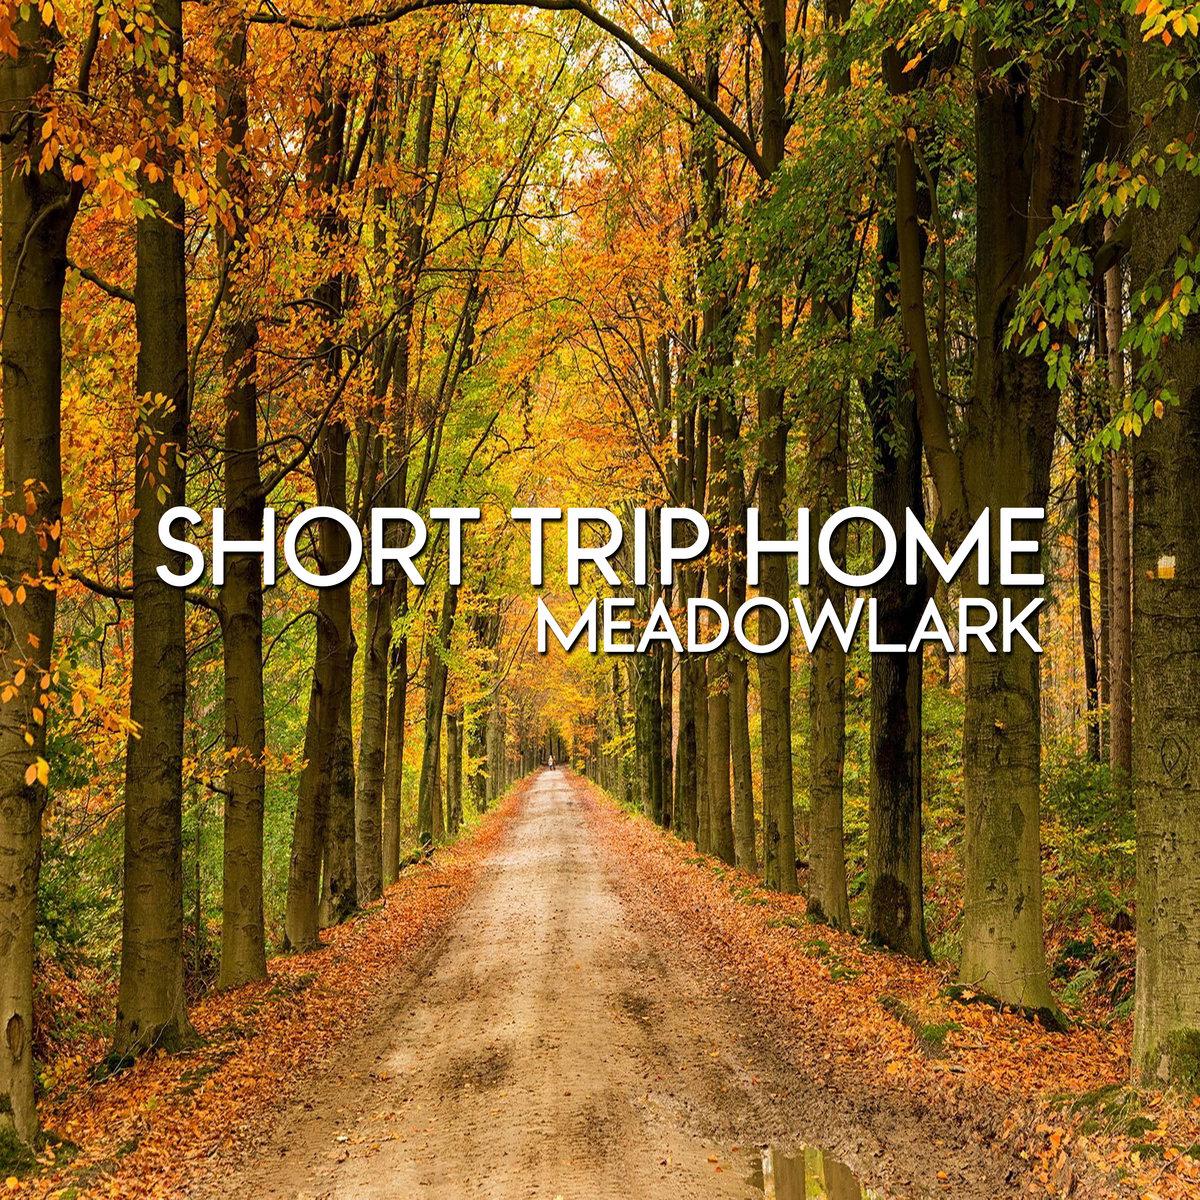 Short Trip Home [single] by Meadowlark